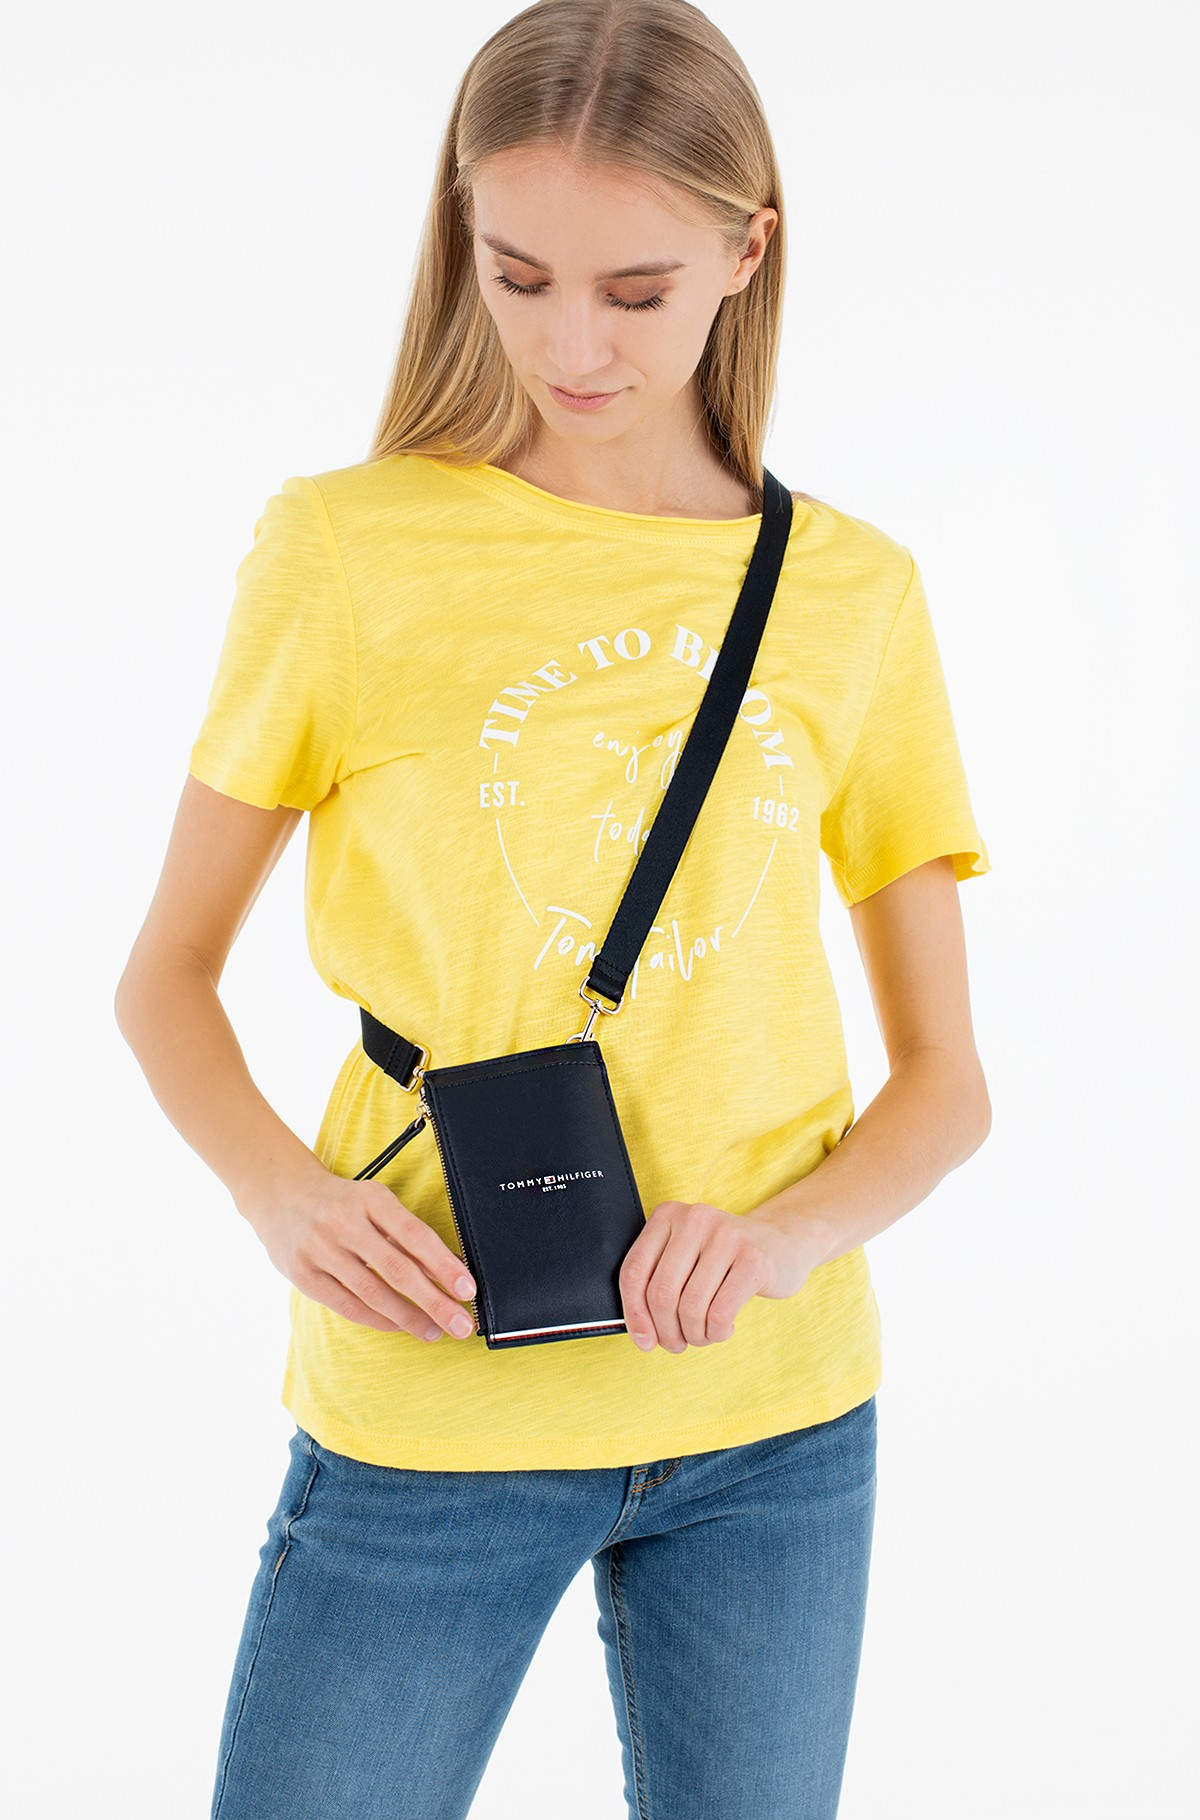 Mobile phone bag  TOMMY SHOPPER PHONE WALLET-full-1